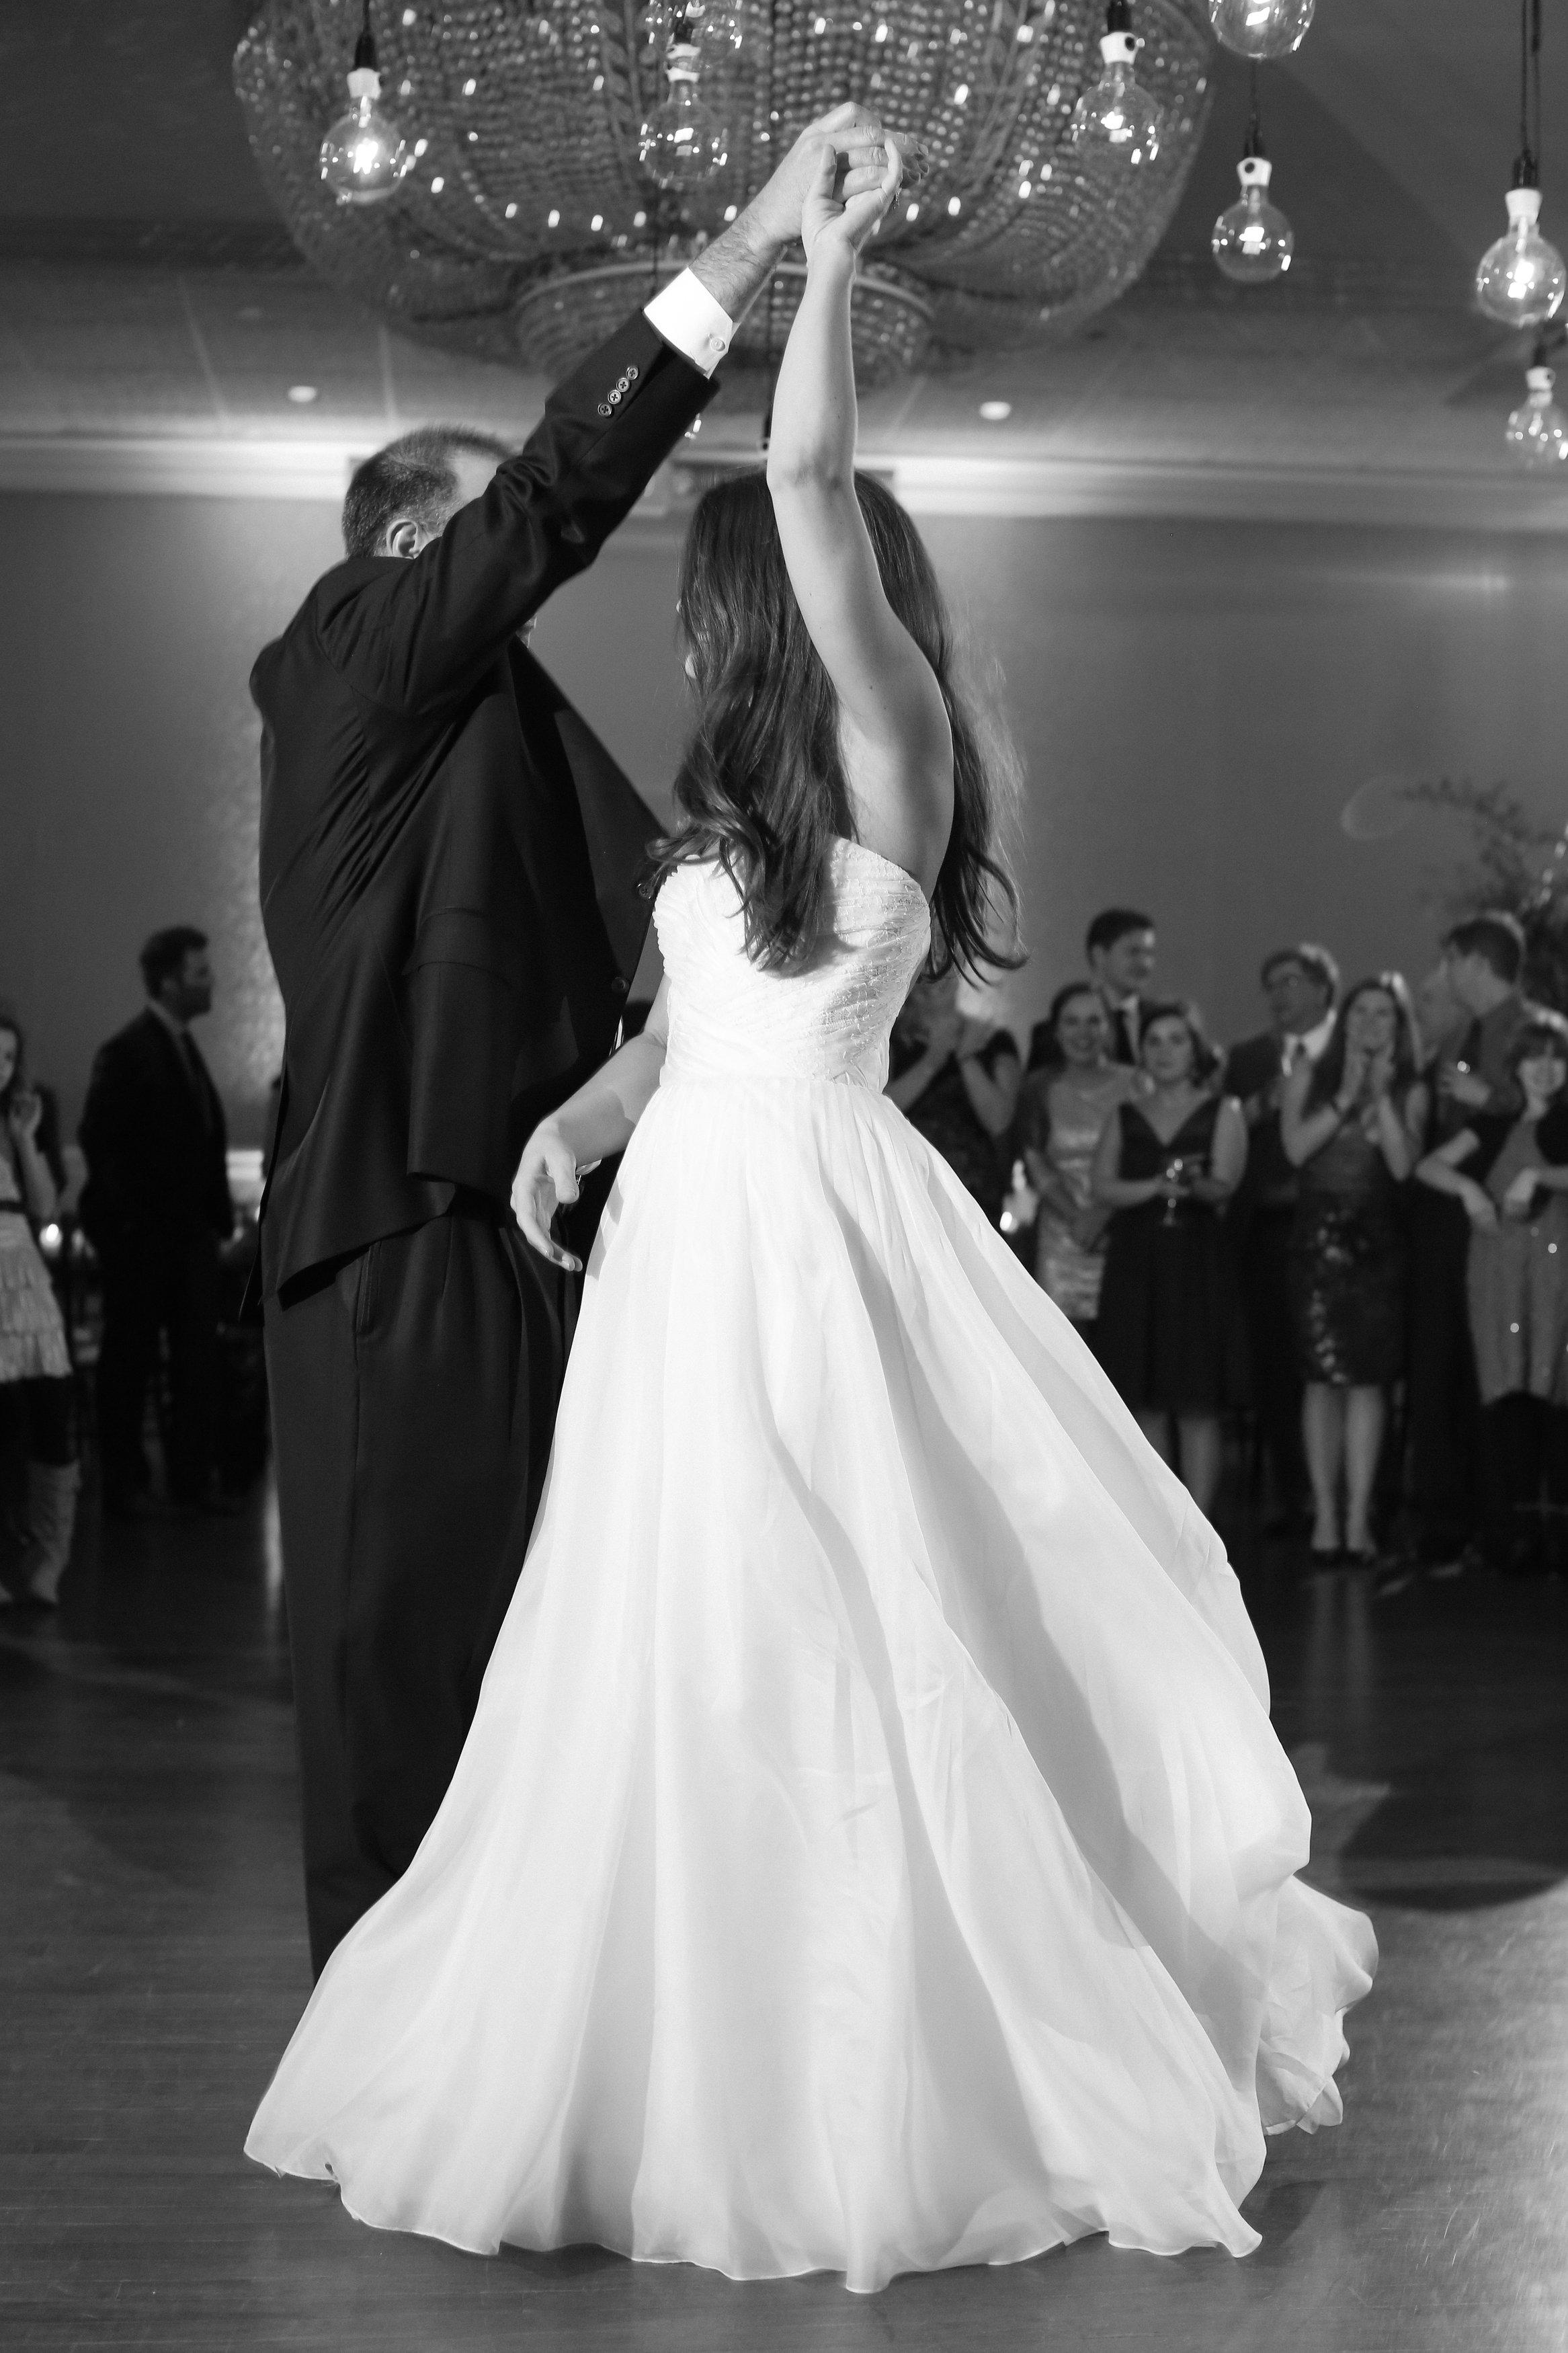 Aaron_Snow_Photography_Dick-Jordan_Wedding_ReceptionCandids.037.jpg